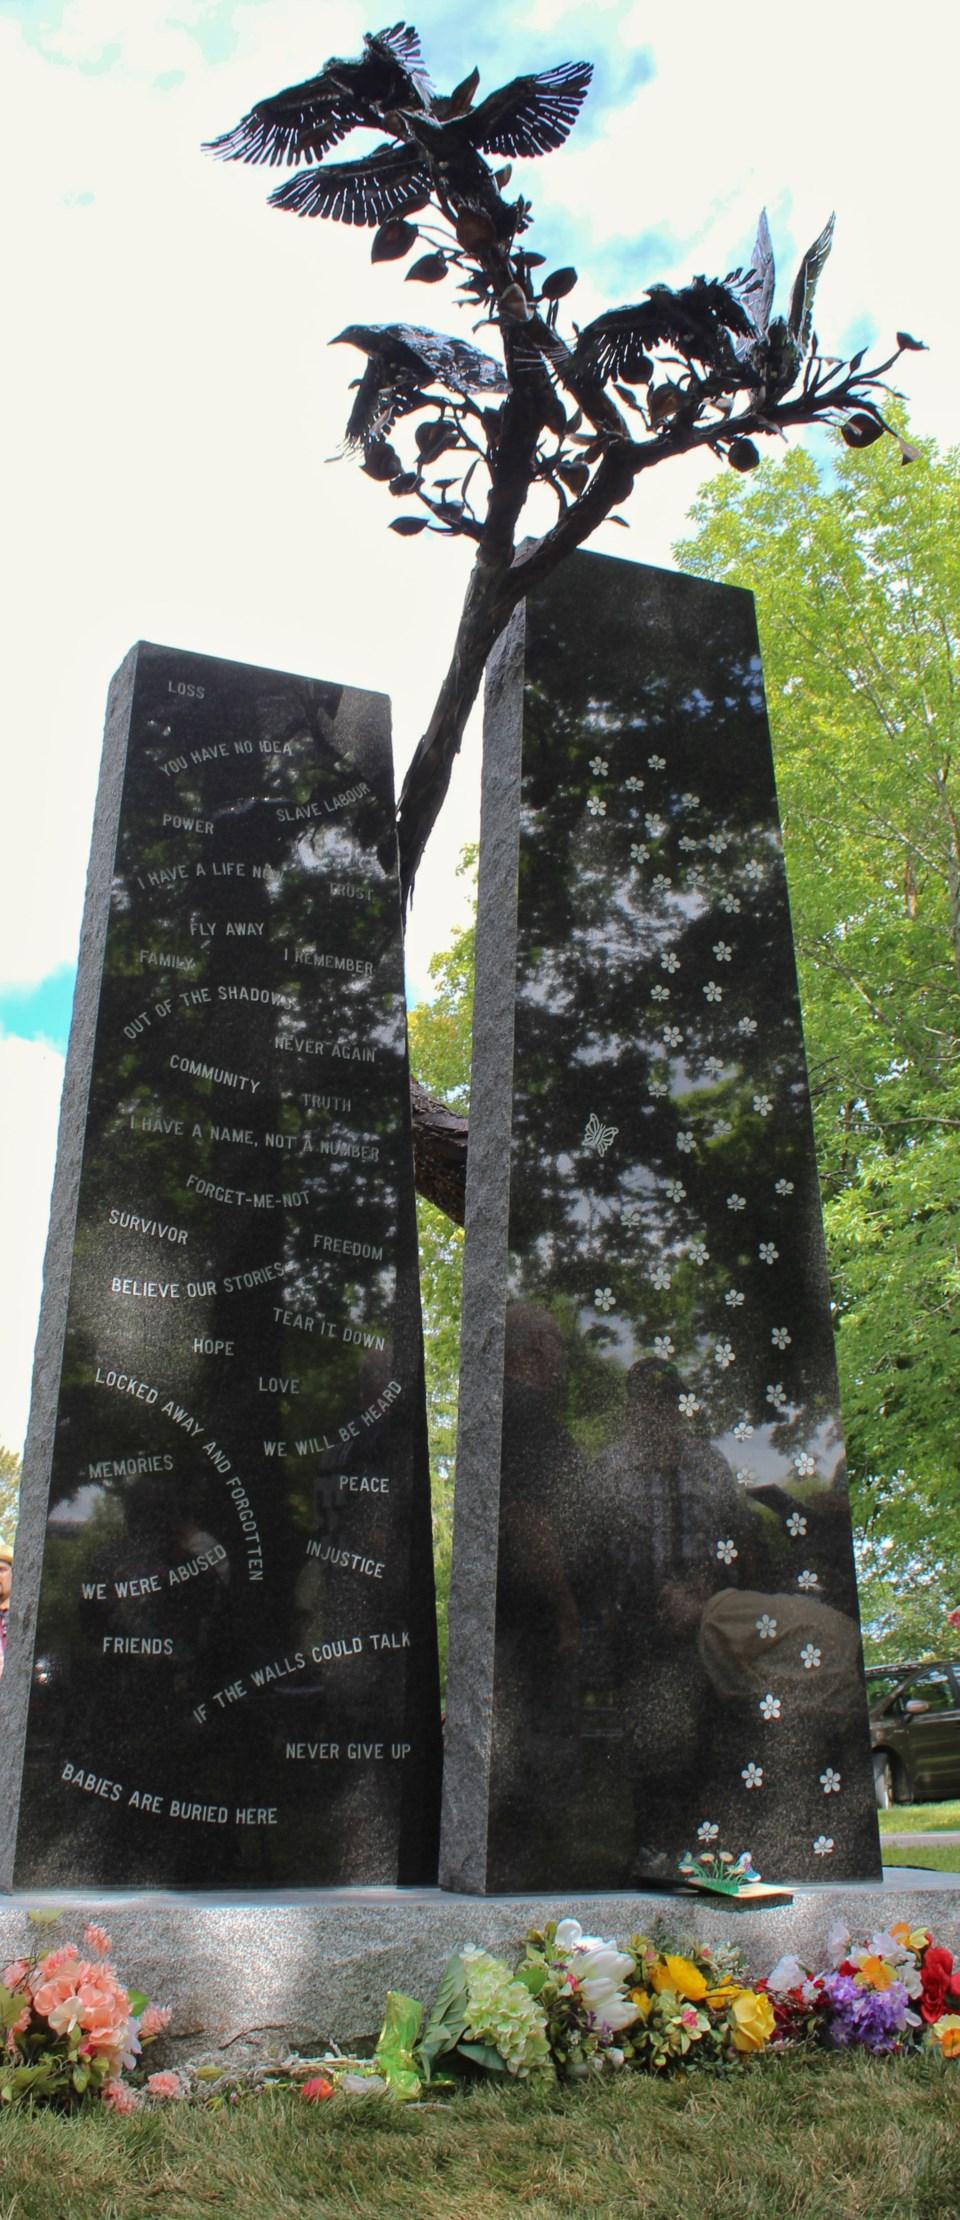 2019-08-24 HRC Cemetery monument 3